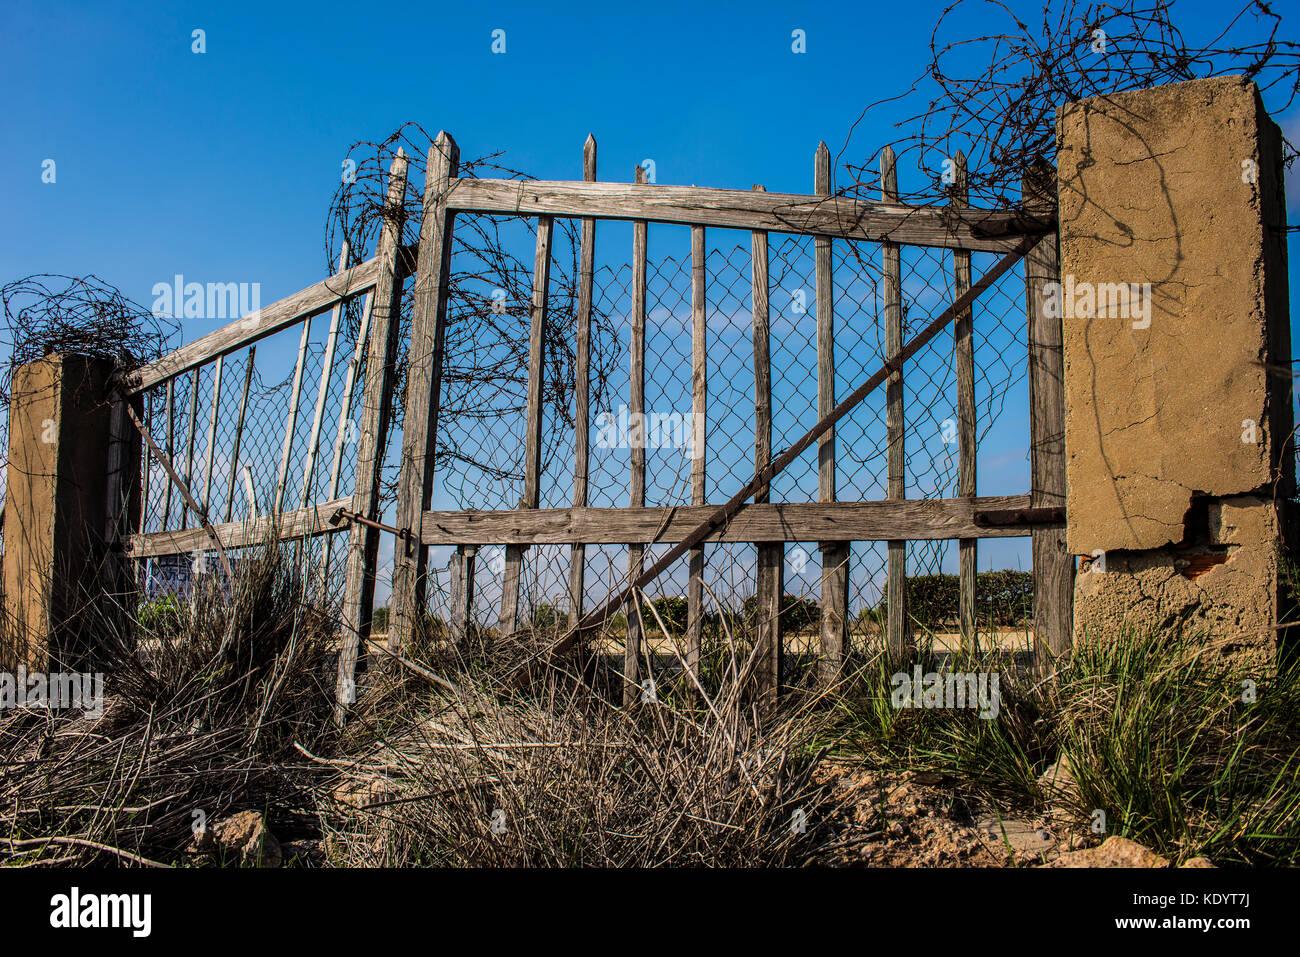 Wooden gates stock photos images alamy